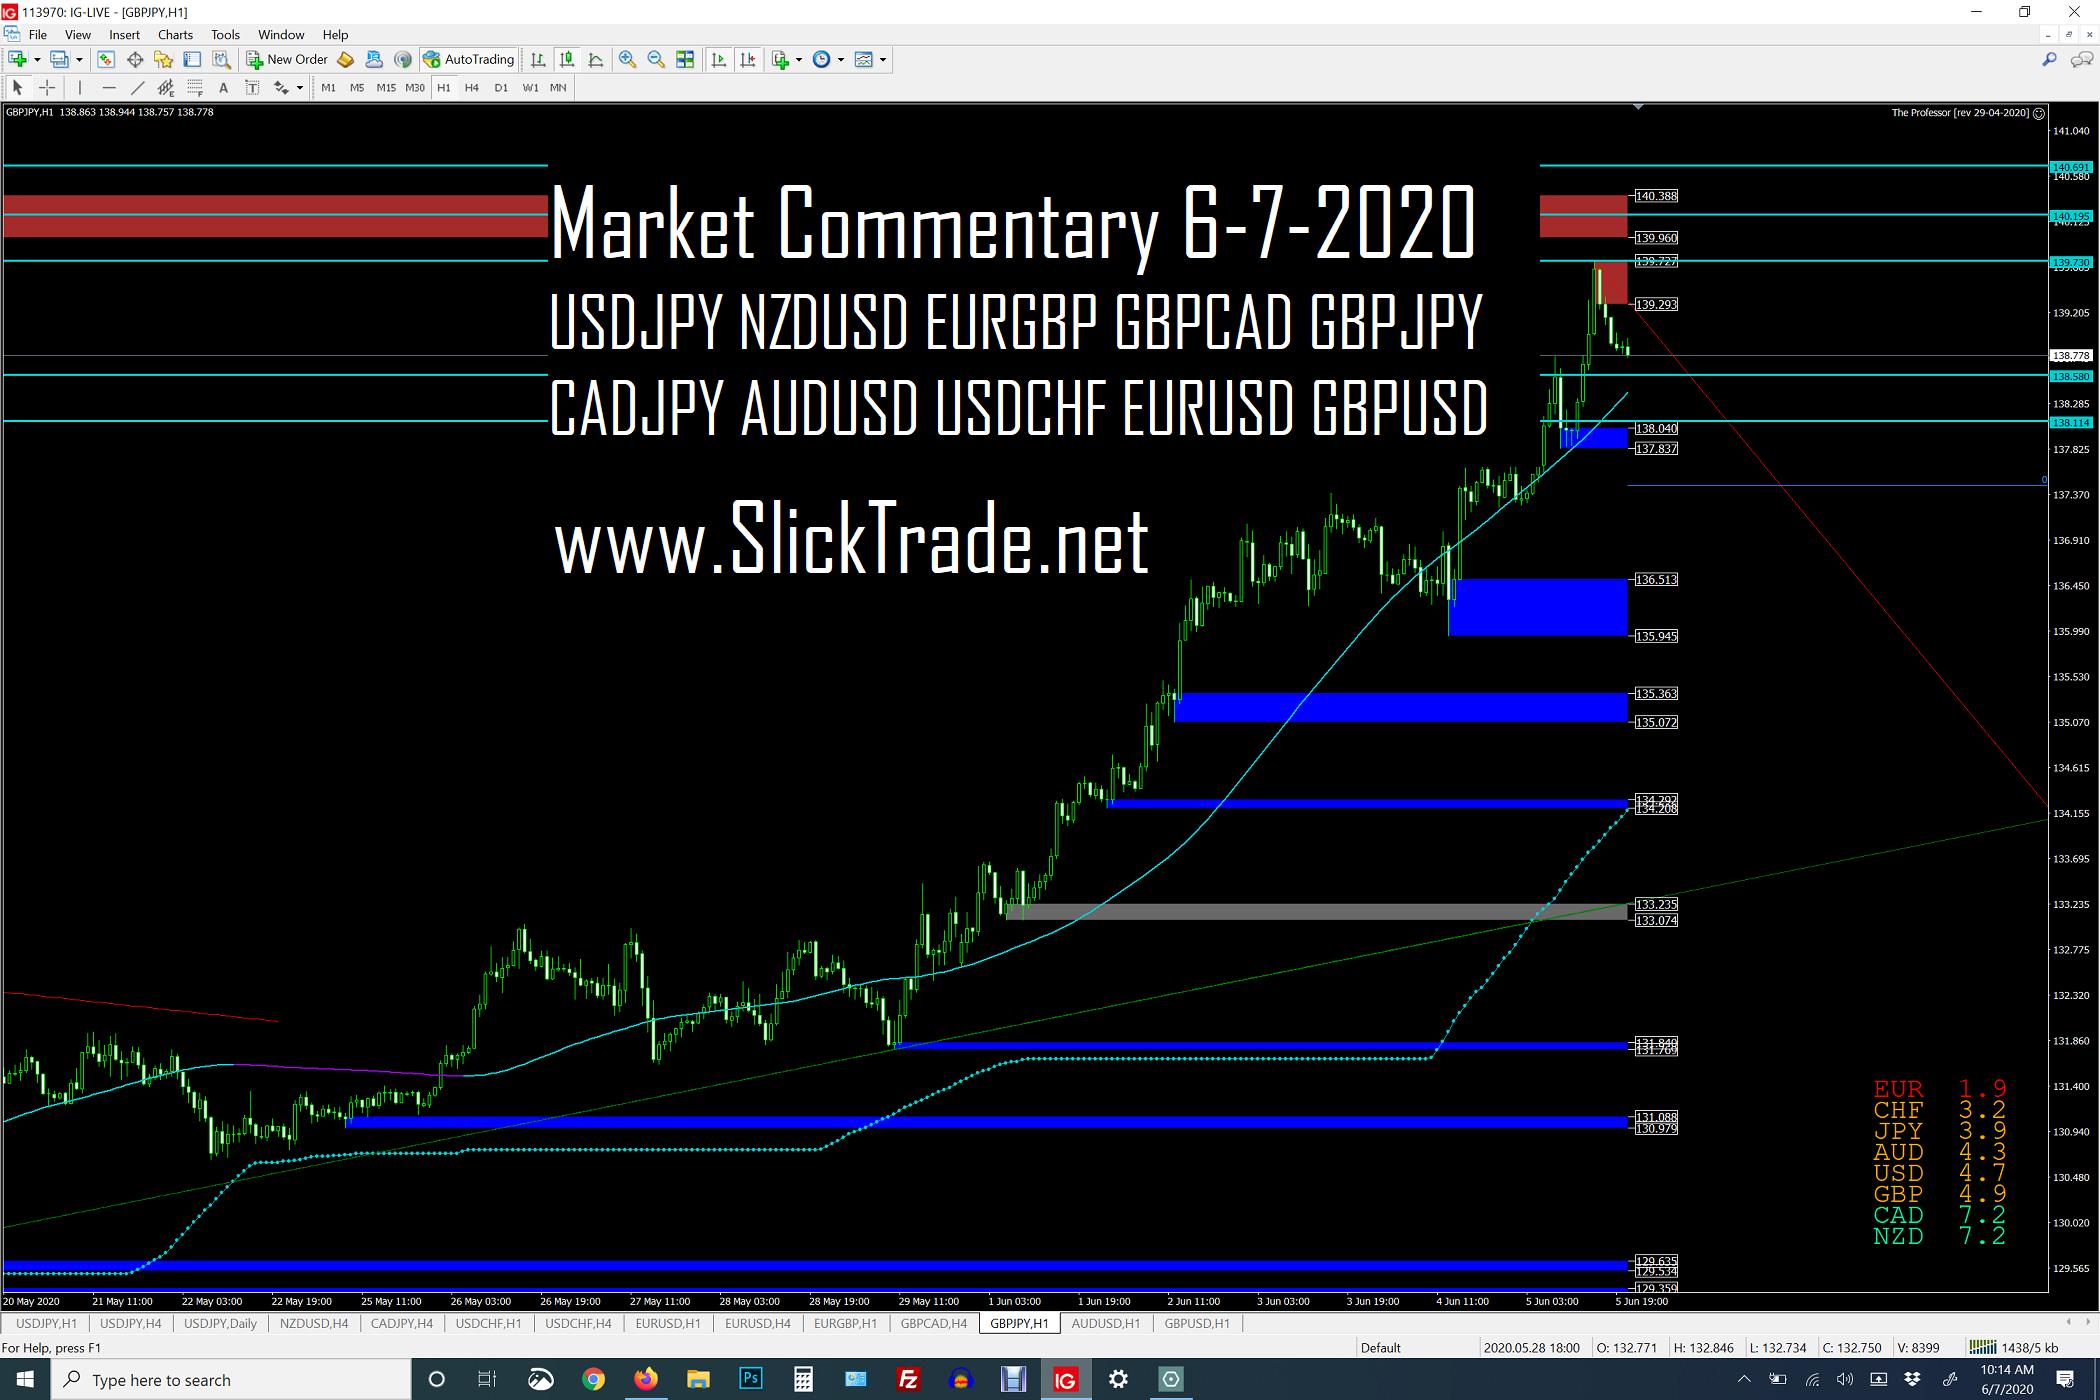 Market Commentary 6-7-2020 - USDJPY NZDUSD EURGBP GBPCAD GBPJPY CADJPY AUDUSD USDCHF EURUSD GBPUSD